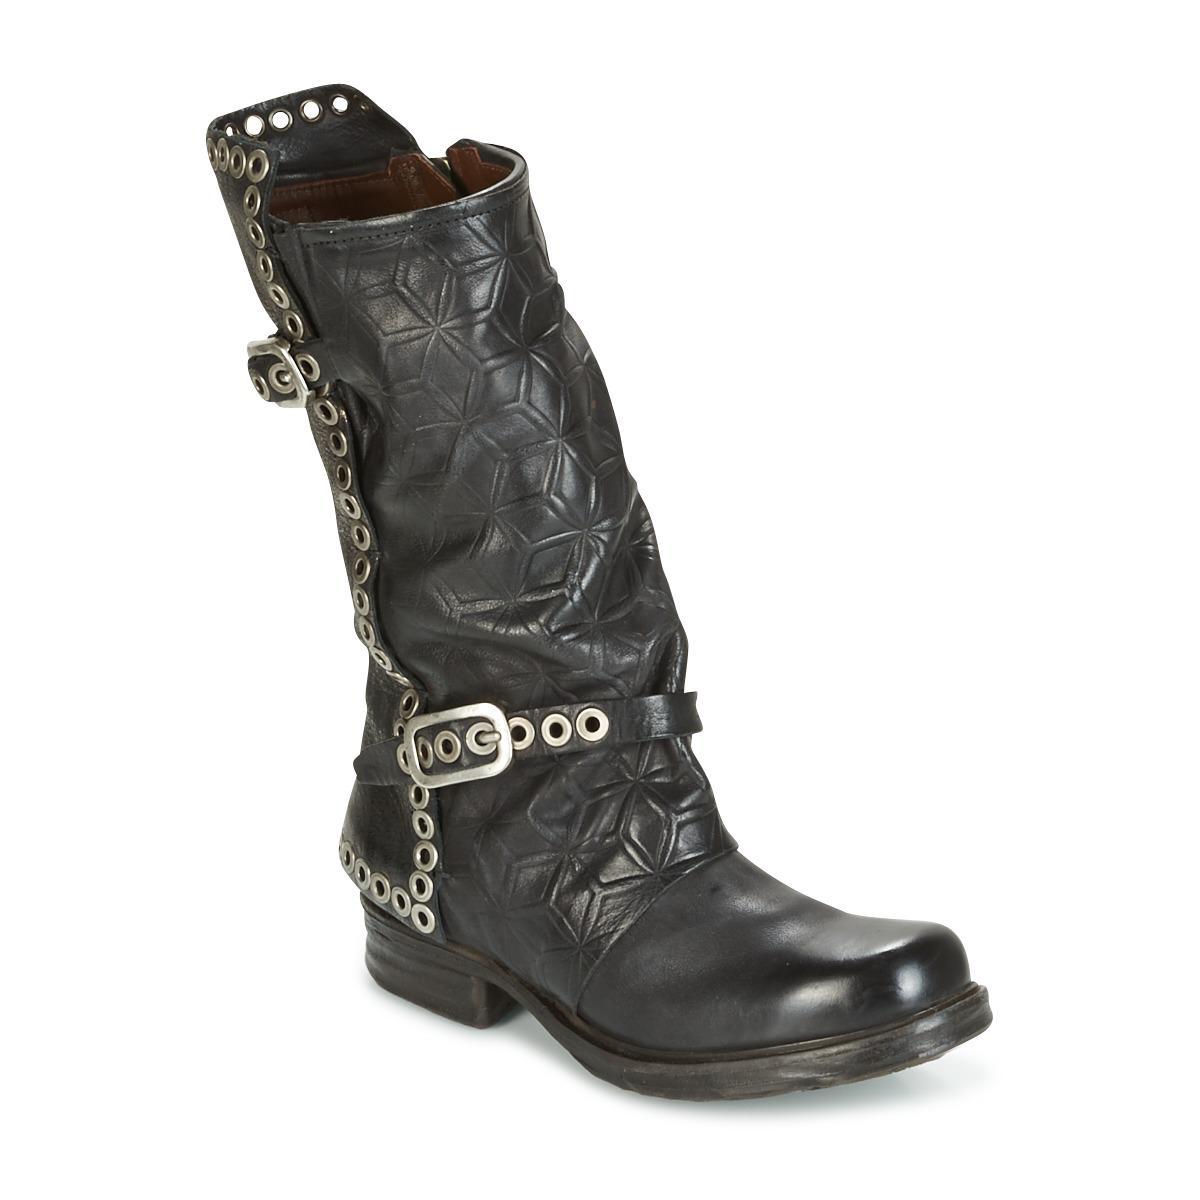 Womens Saintec High Boots A.S.98 Free Shipping Low Shipping JL73b